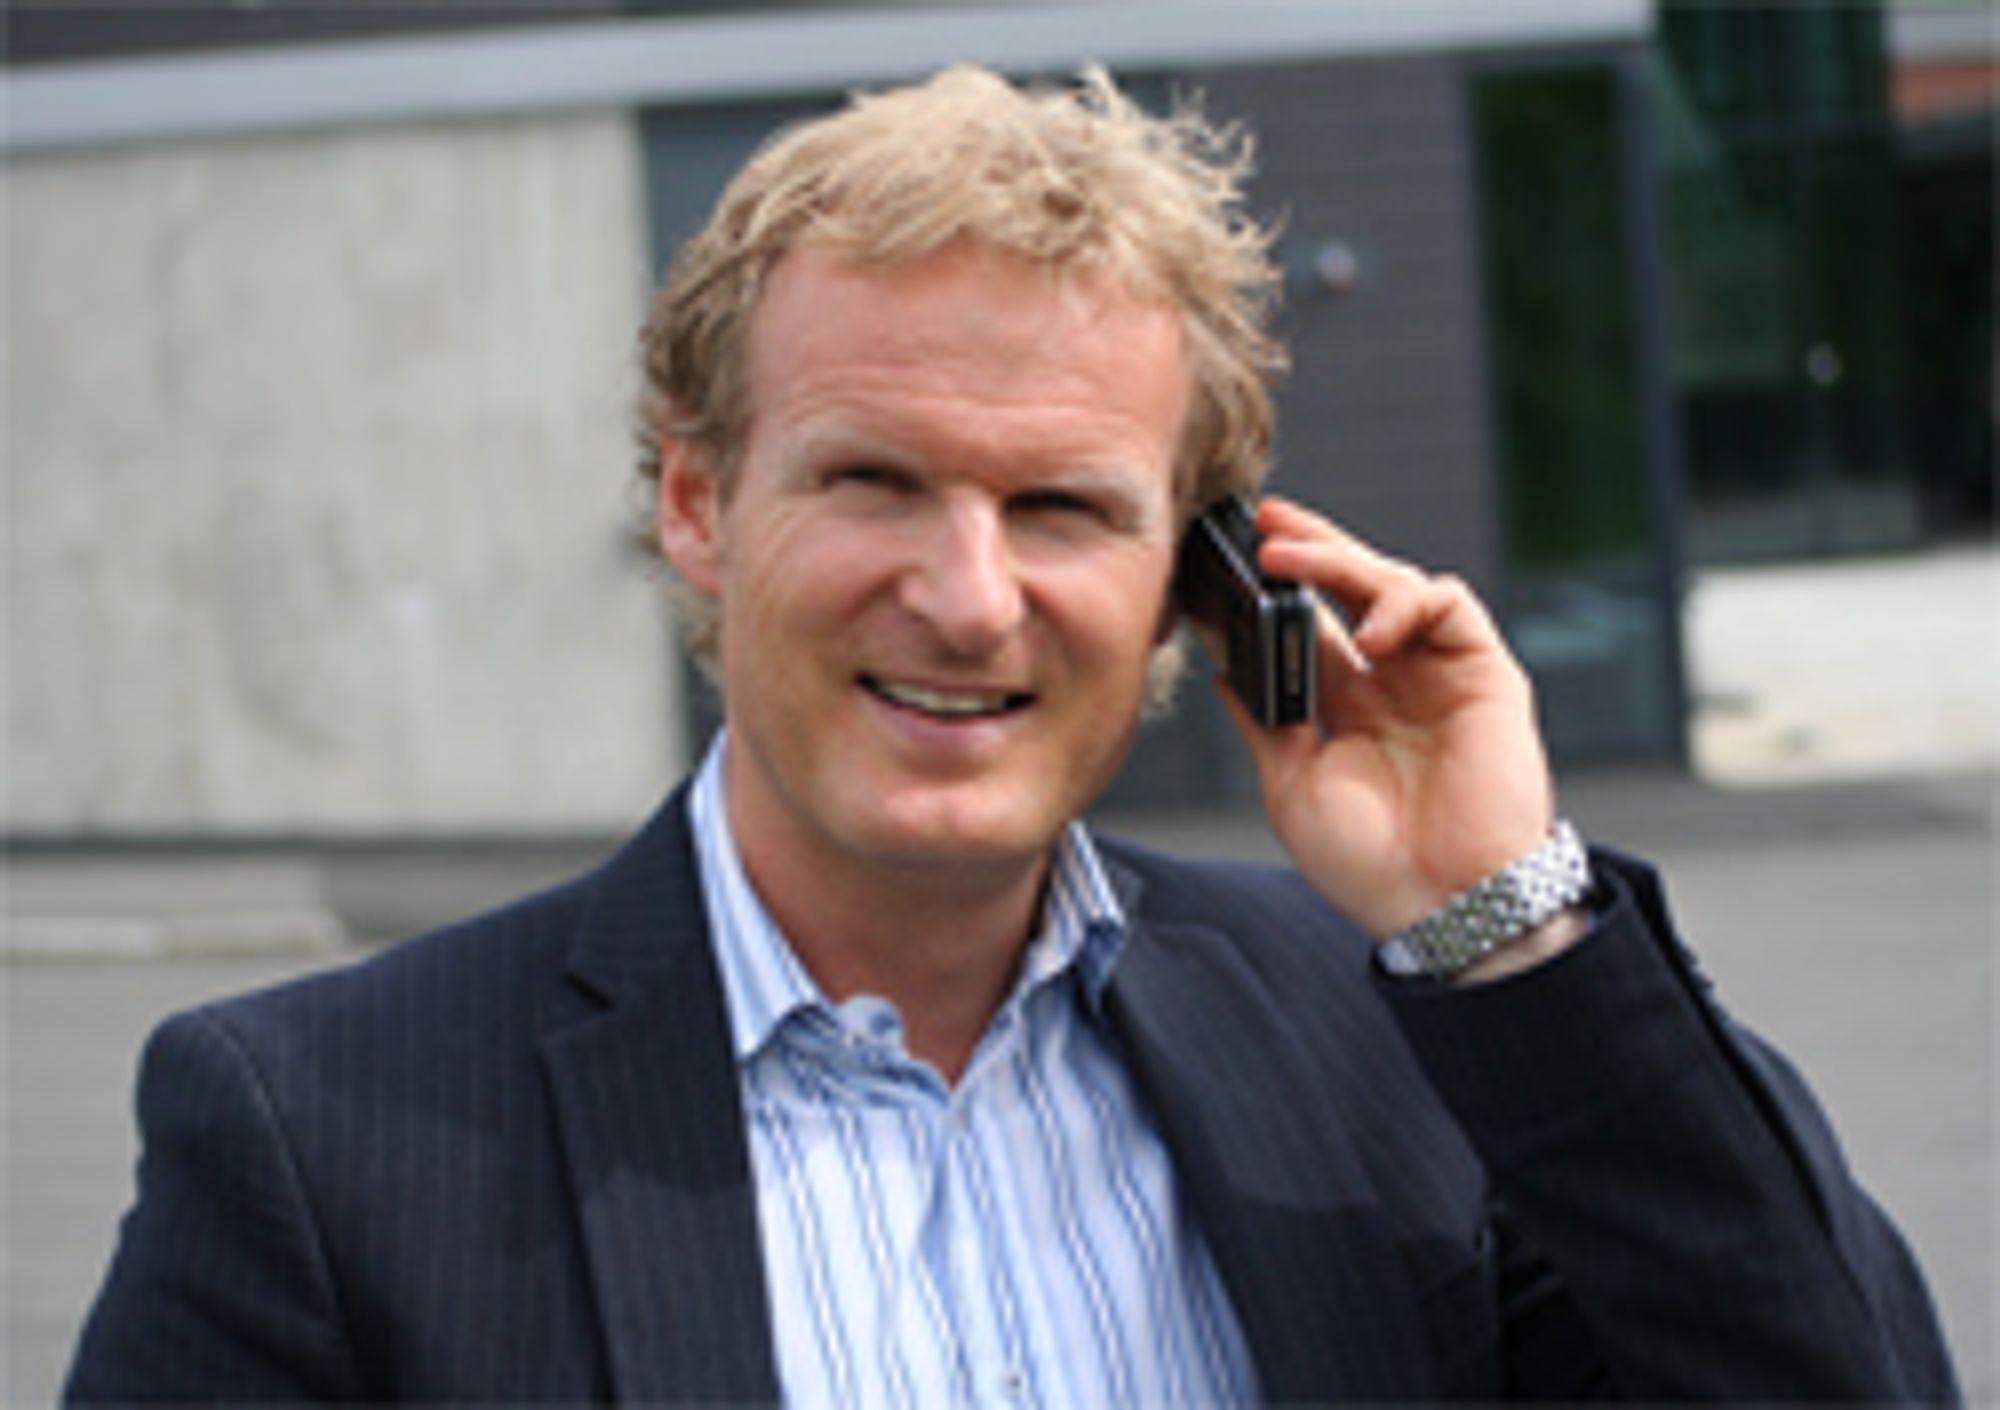 Tele2-sjef Haakon Dyrnes svarer på dine spørsmål.